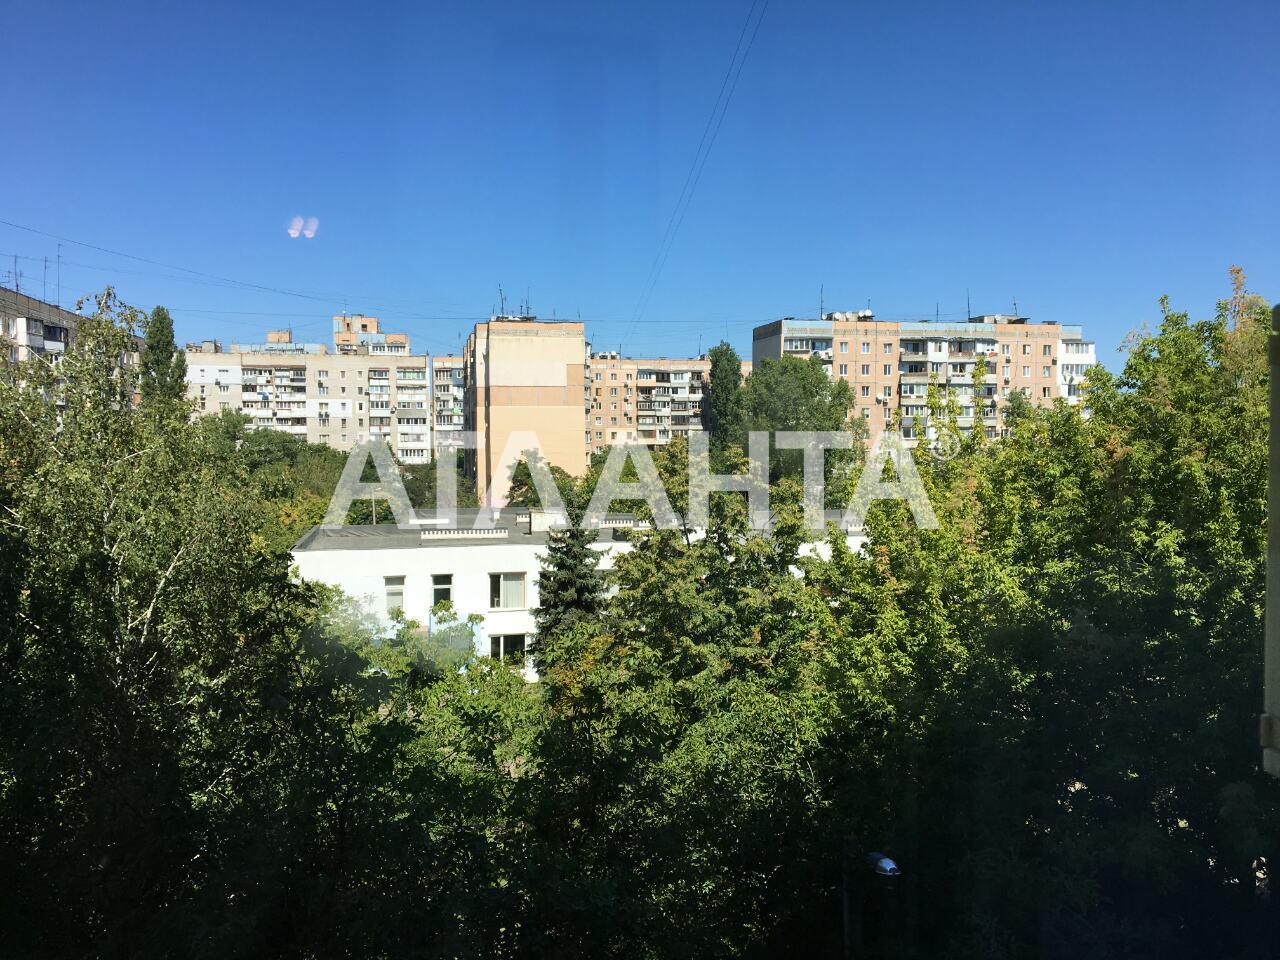 Продается 3-комнатная Квартира на ул. Архитекторская — 49 000 у.е. (фото №9)